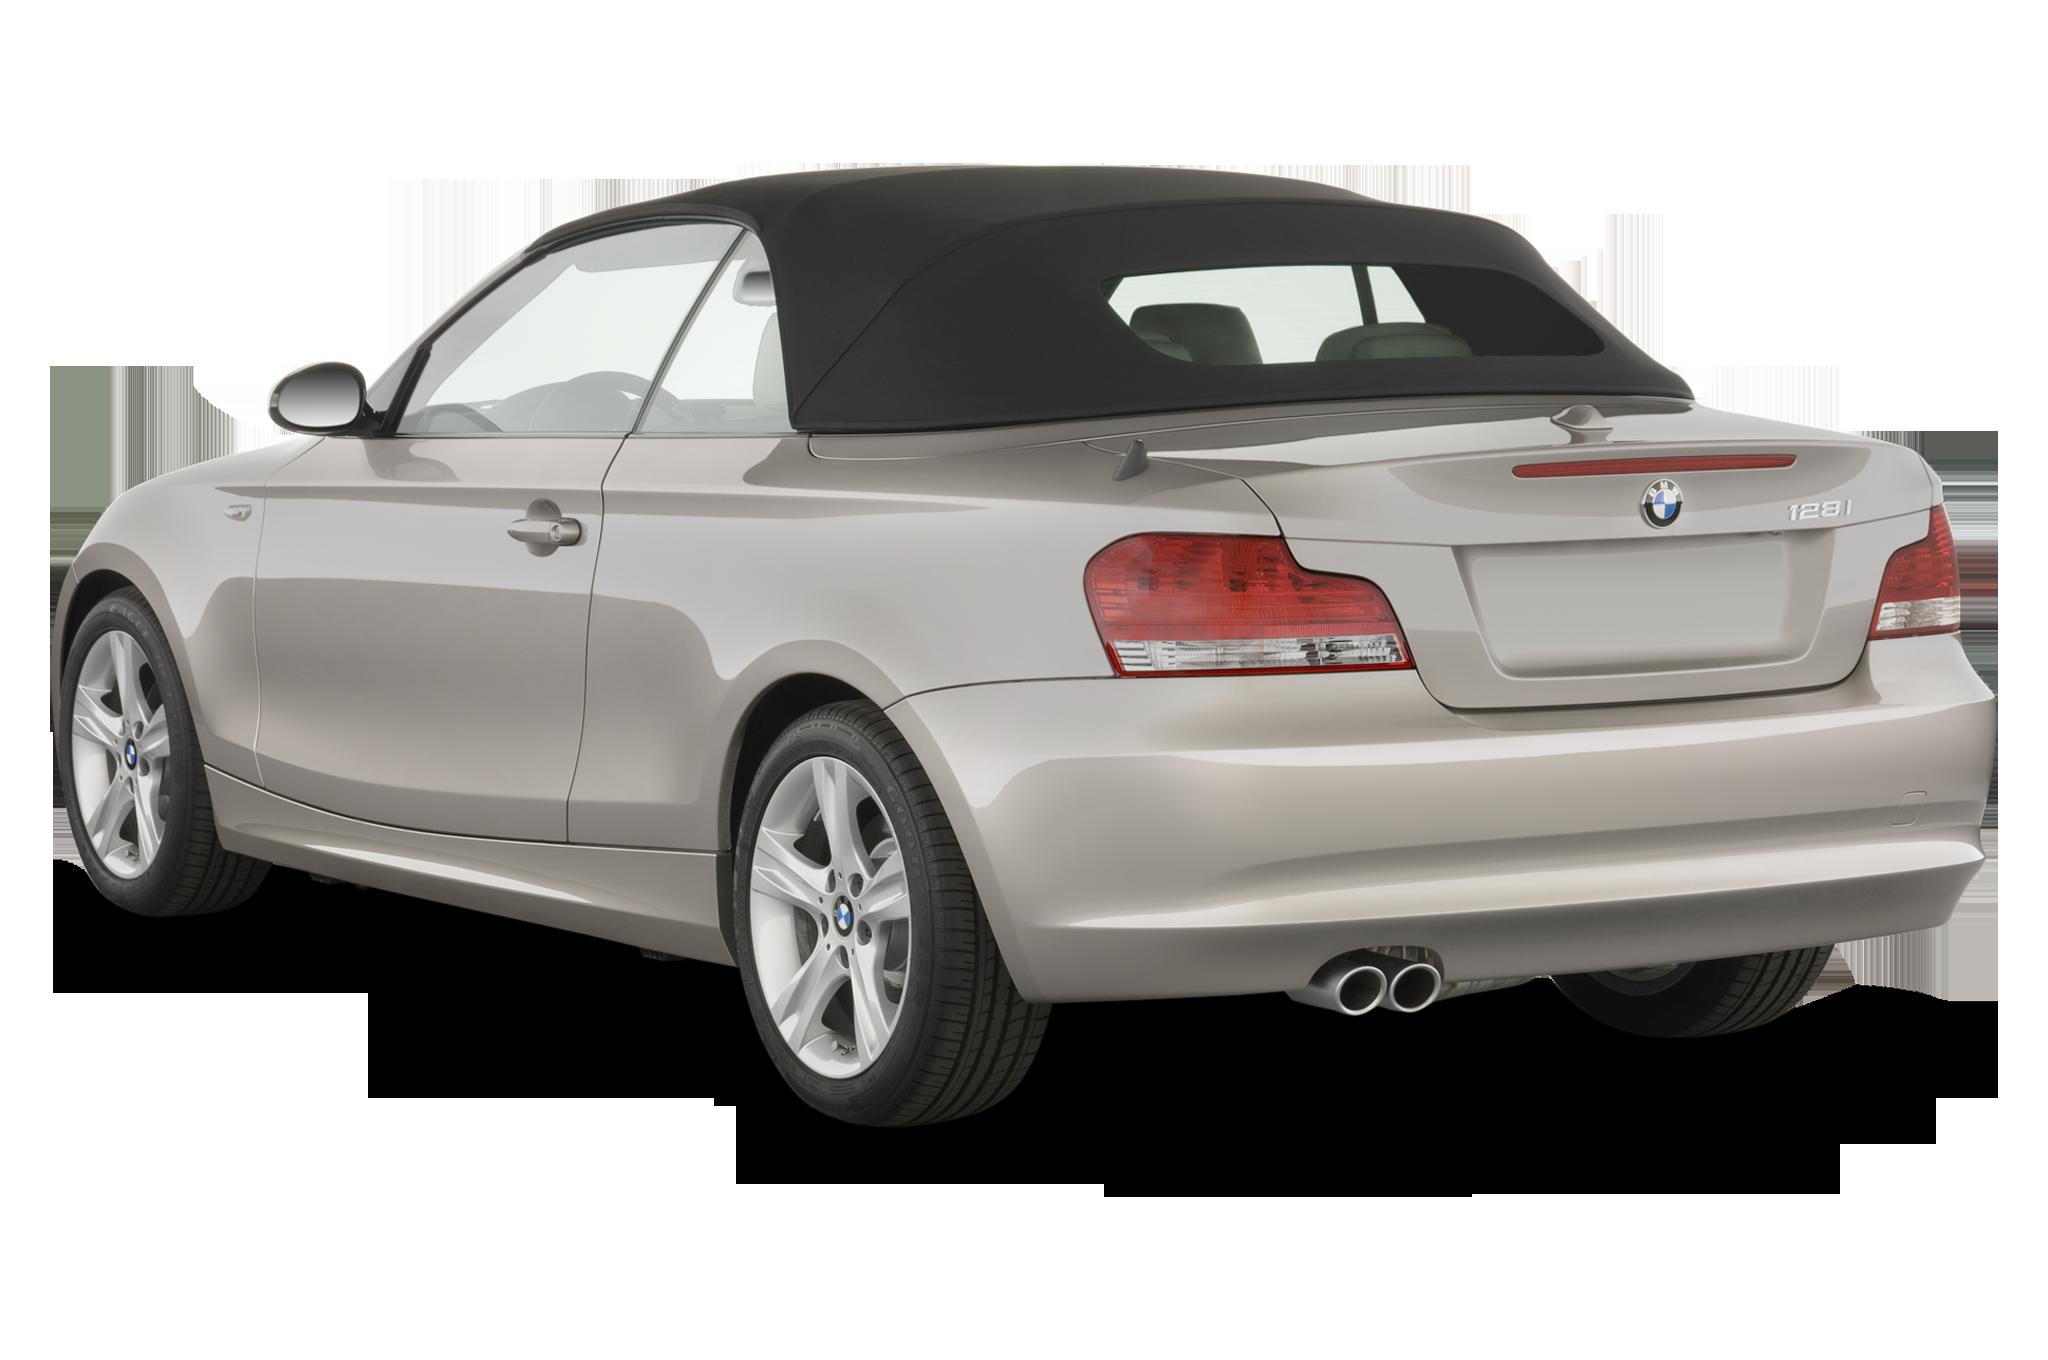 Bmw 128i Convertible >> 2010 BMW 128i Coupe - Automobile Magazine